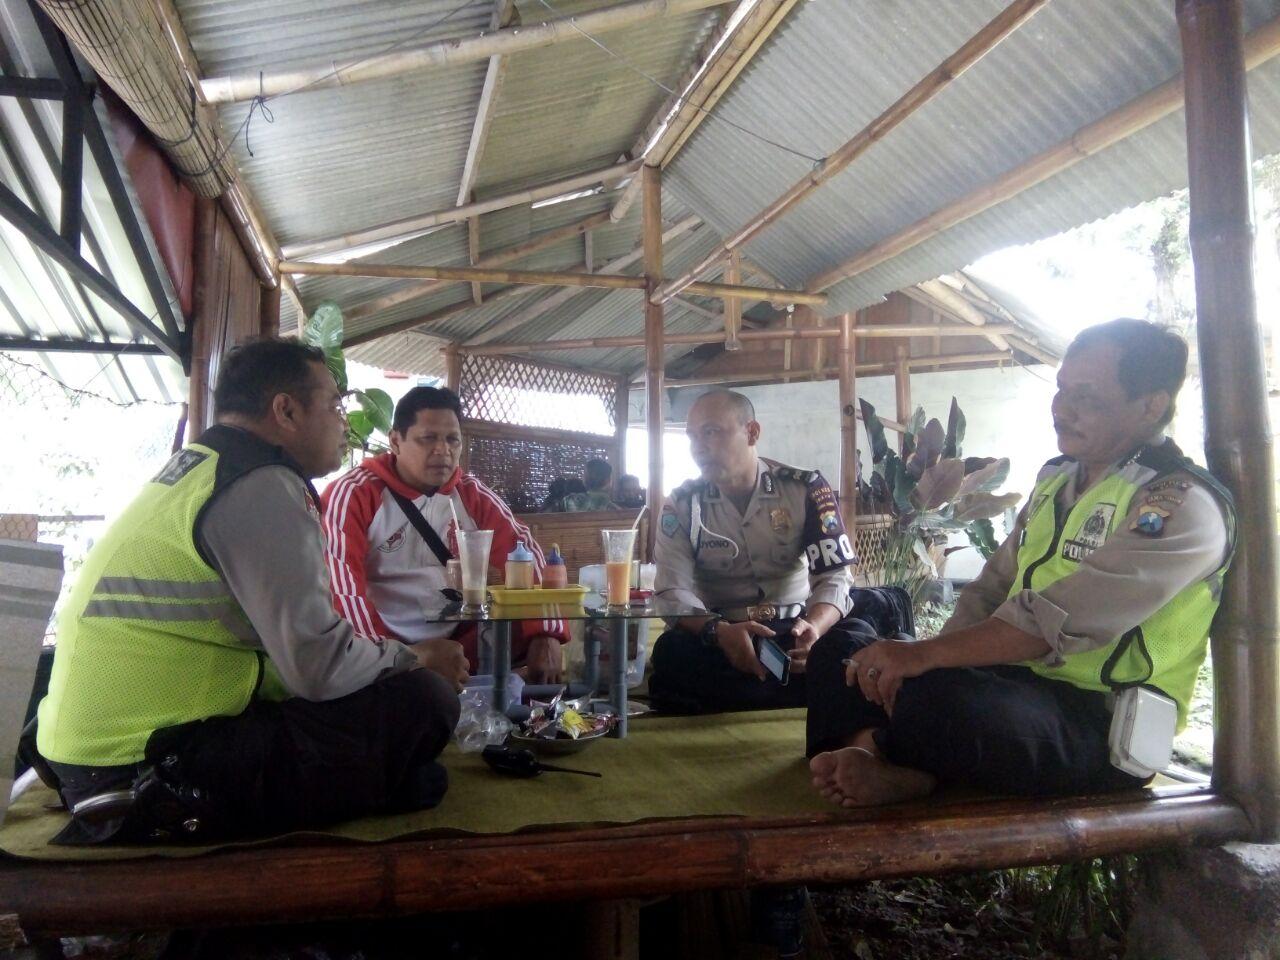 Cangkruan Kamtibmas Patroli Polsek Bumiaji Polres Batu Dalam Mendukung Operasi Zebra 2017